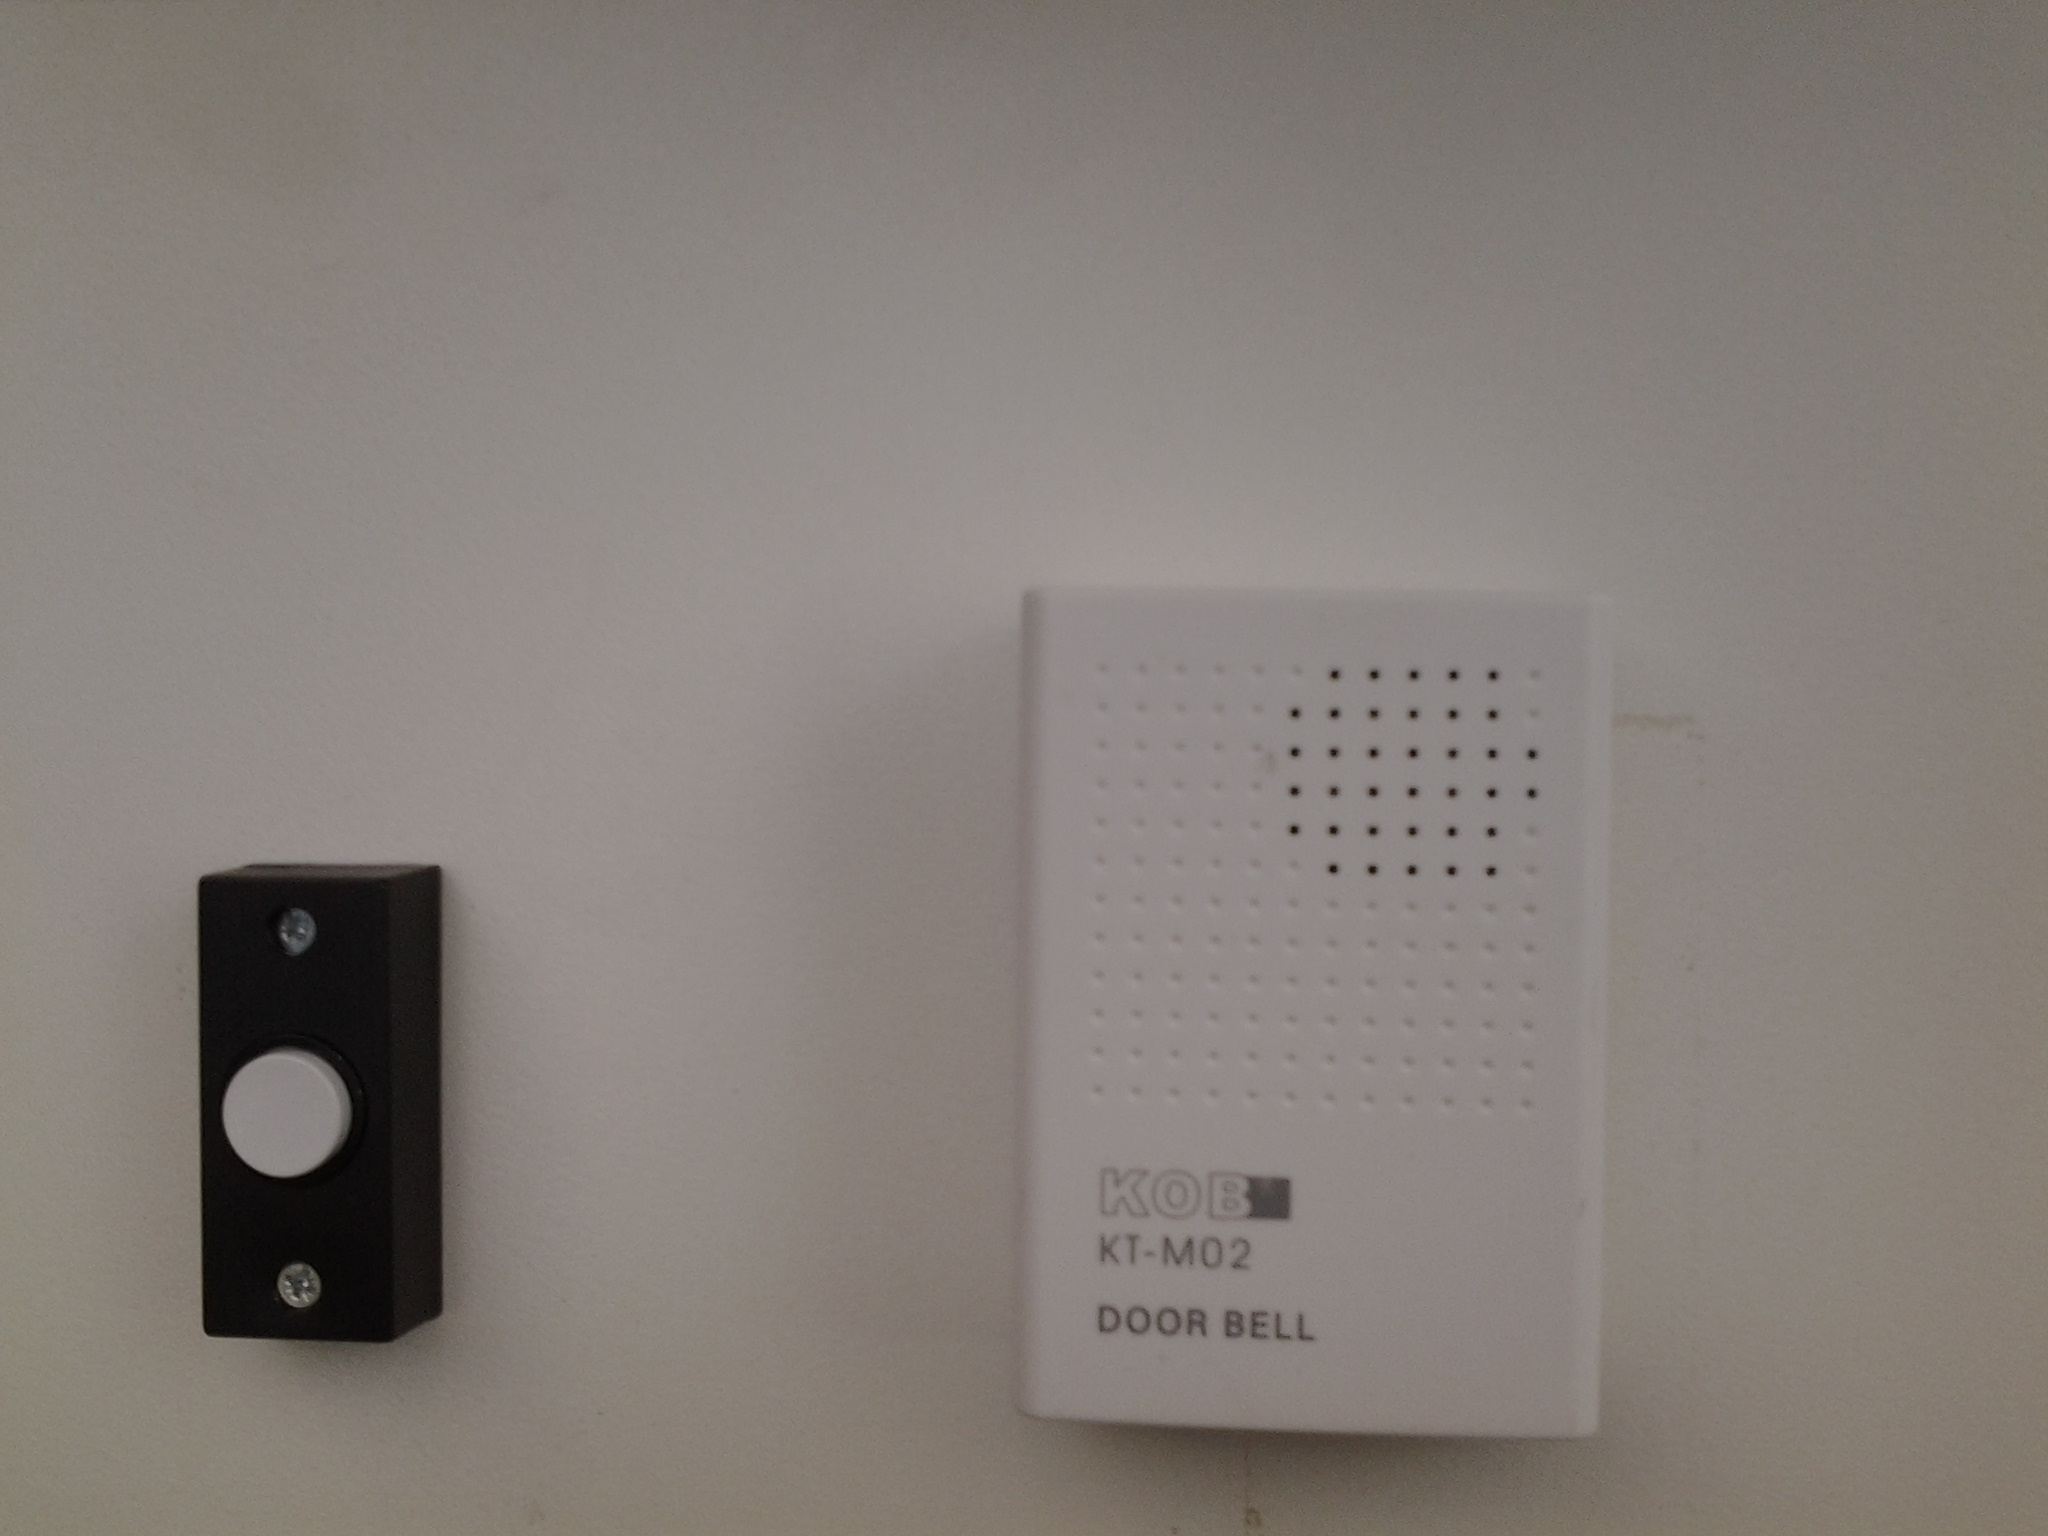 door chime wiring diagram cj lancer stereo hard wired doorbells supply & fit in melbourne